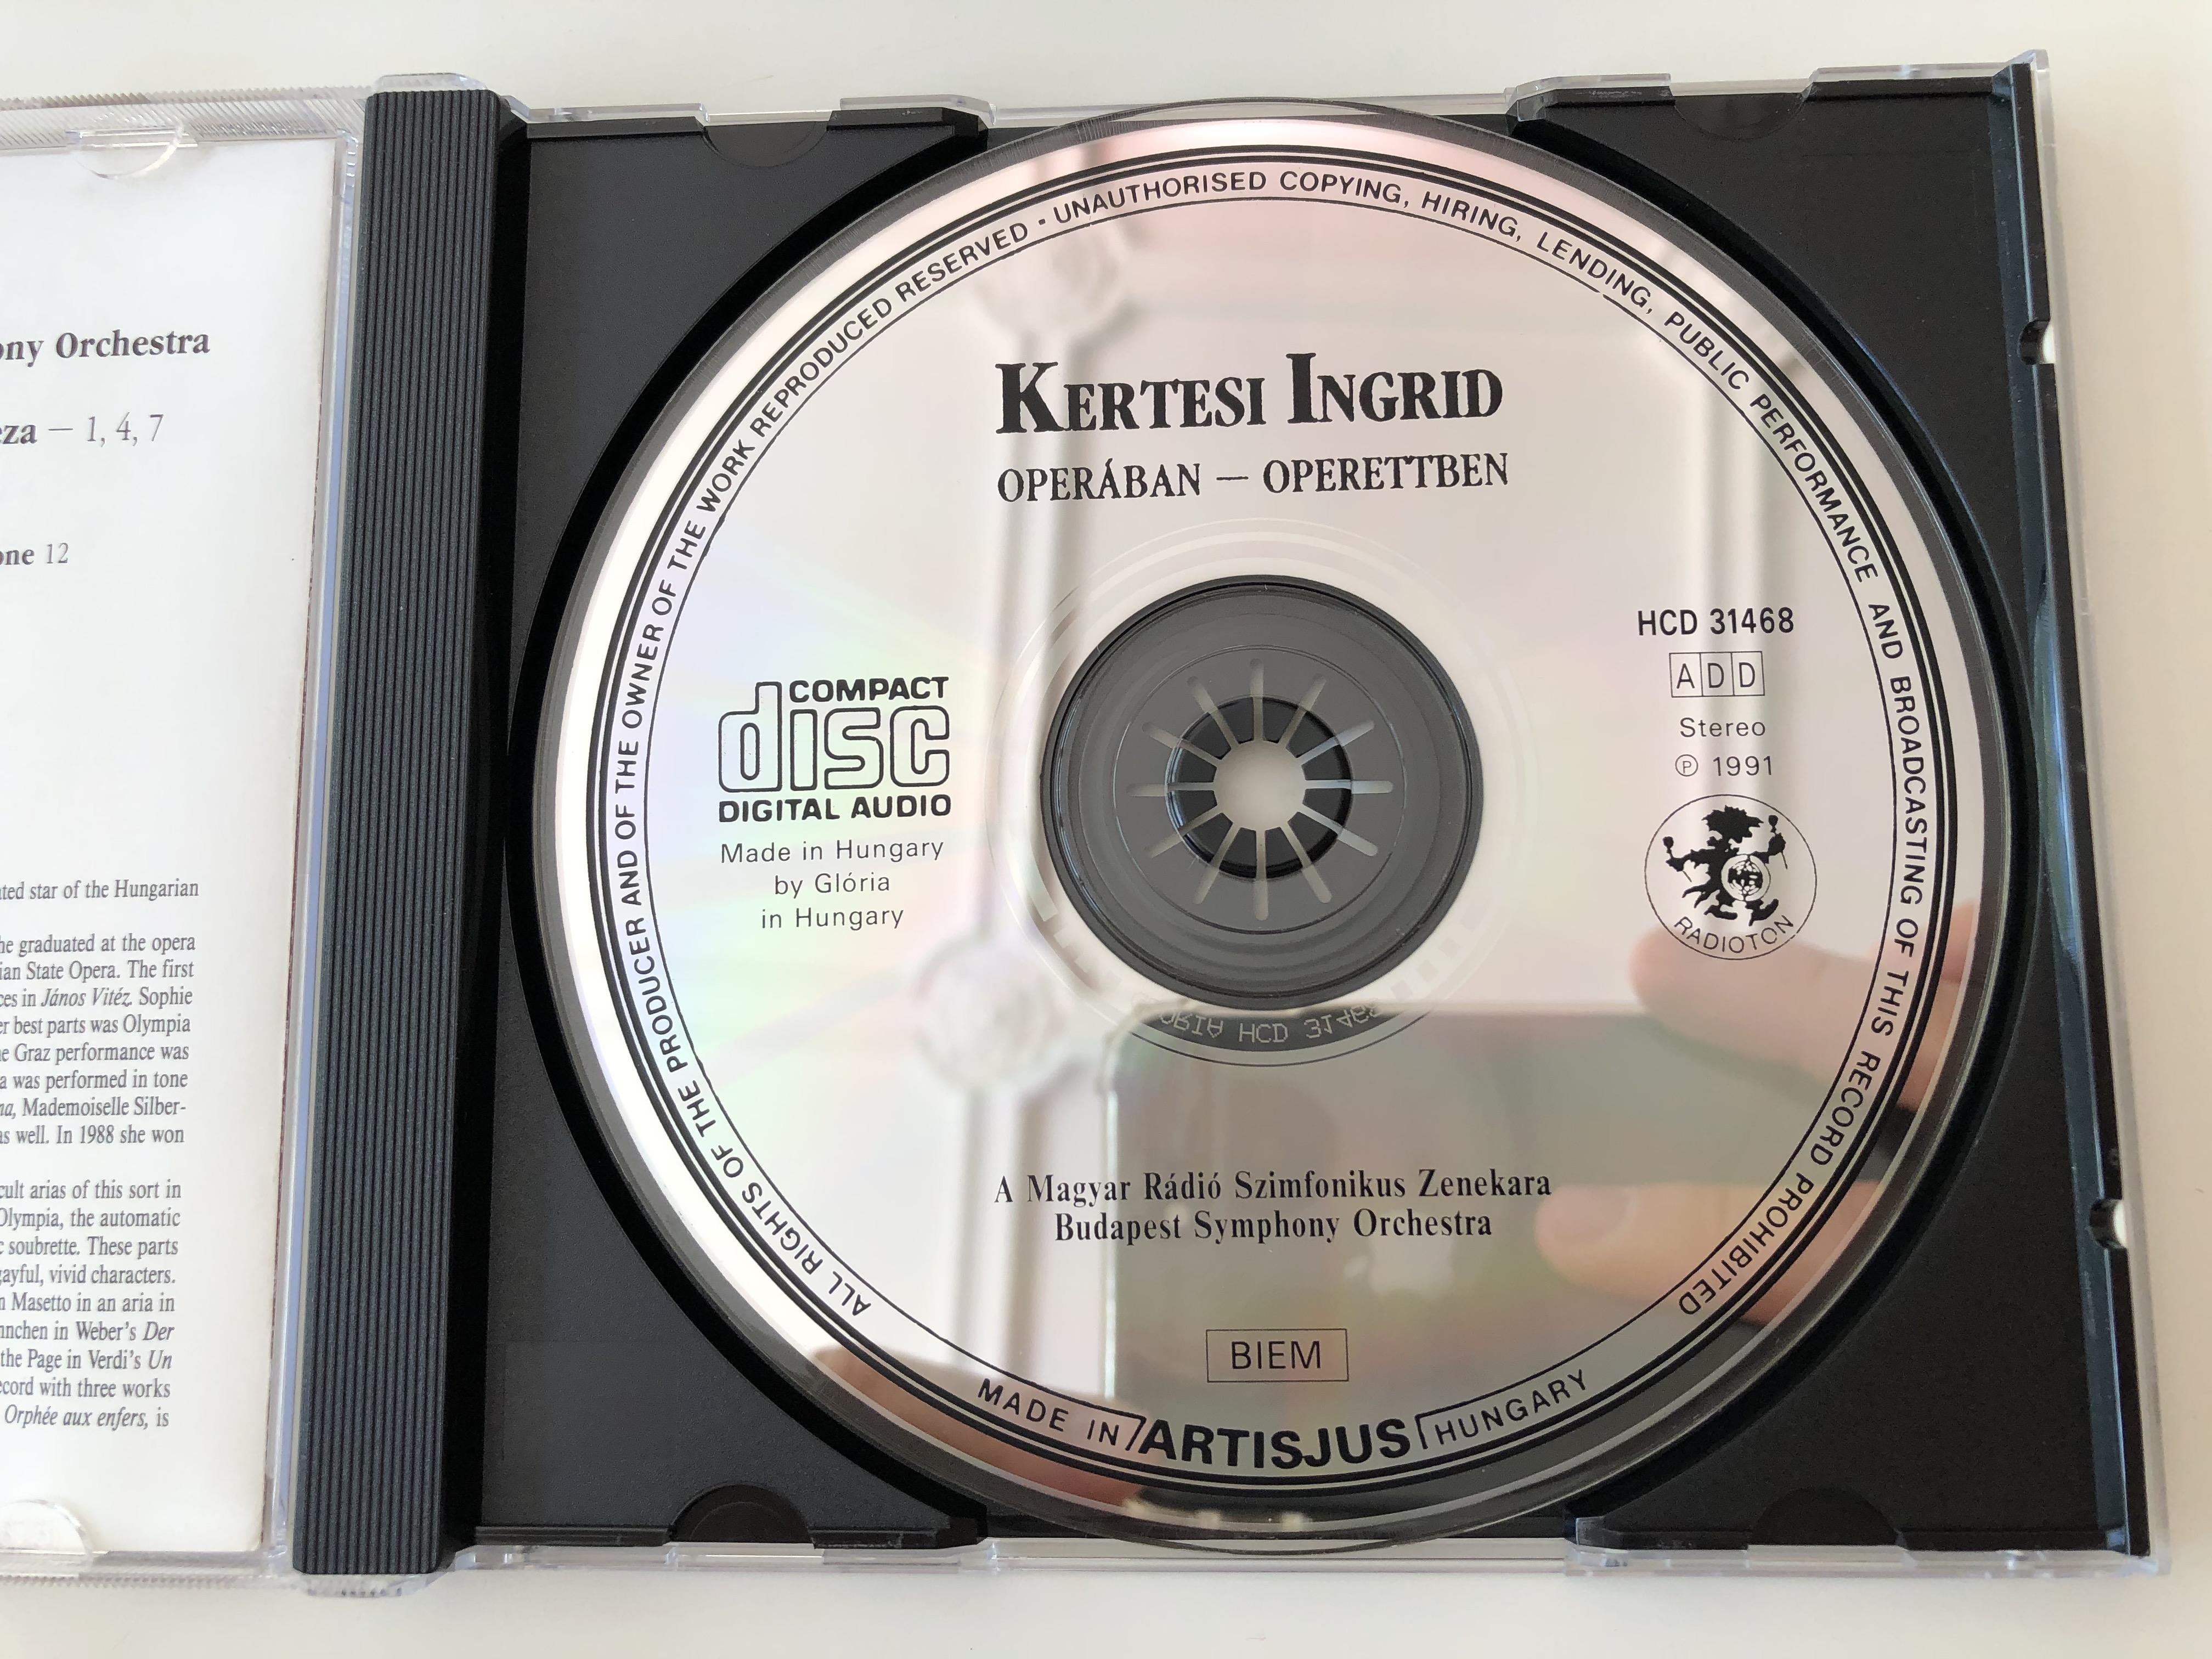 kertesi-ingrid-oper-ban-operettben-magyar-r-di-szimf-nikus-zenekara-budapest-symphony-orchestra-radioton-audio-cd-1991-stereo-hcd-31468-4-.jpg